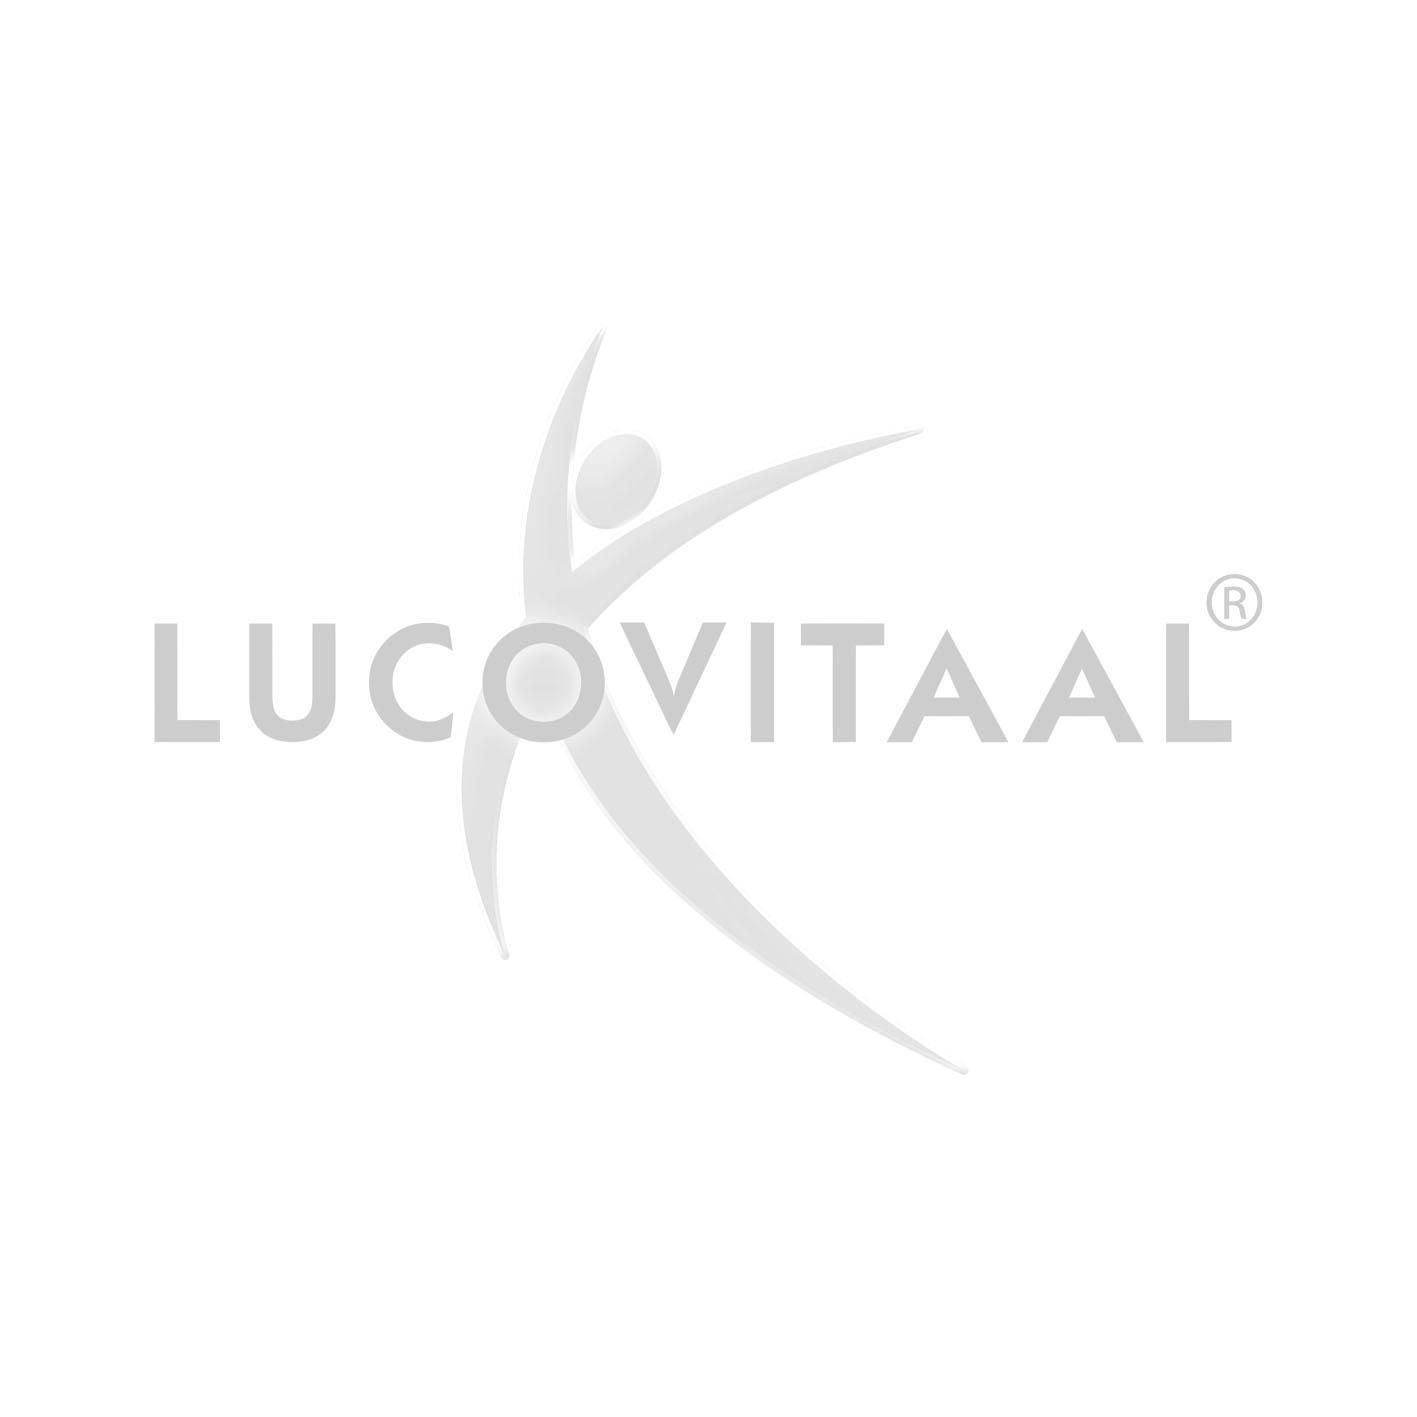 bb7d6044a06 Bamboe Sokken? 1 paar €4,95 3 paar €6,95 | Lucovitaal - officiële ...